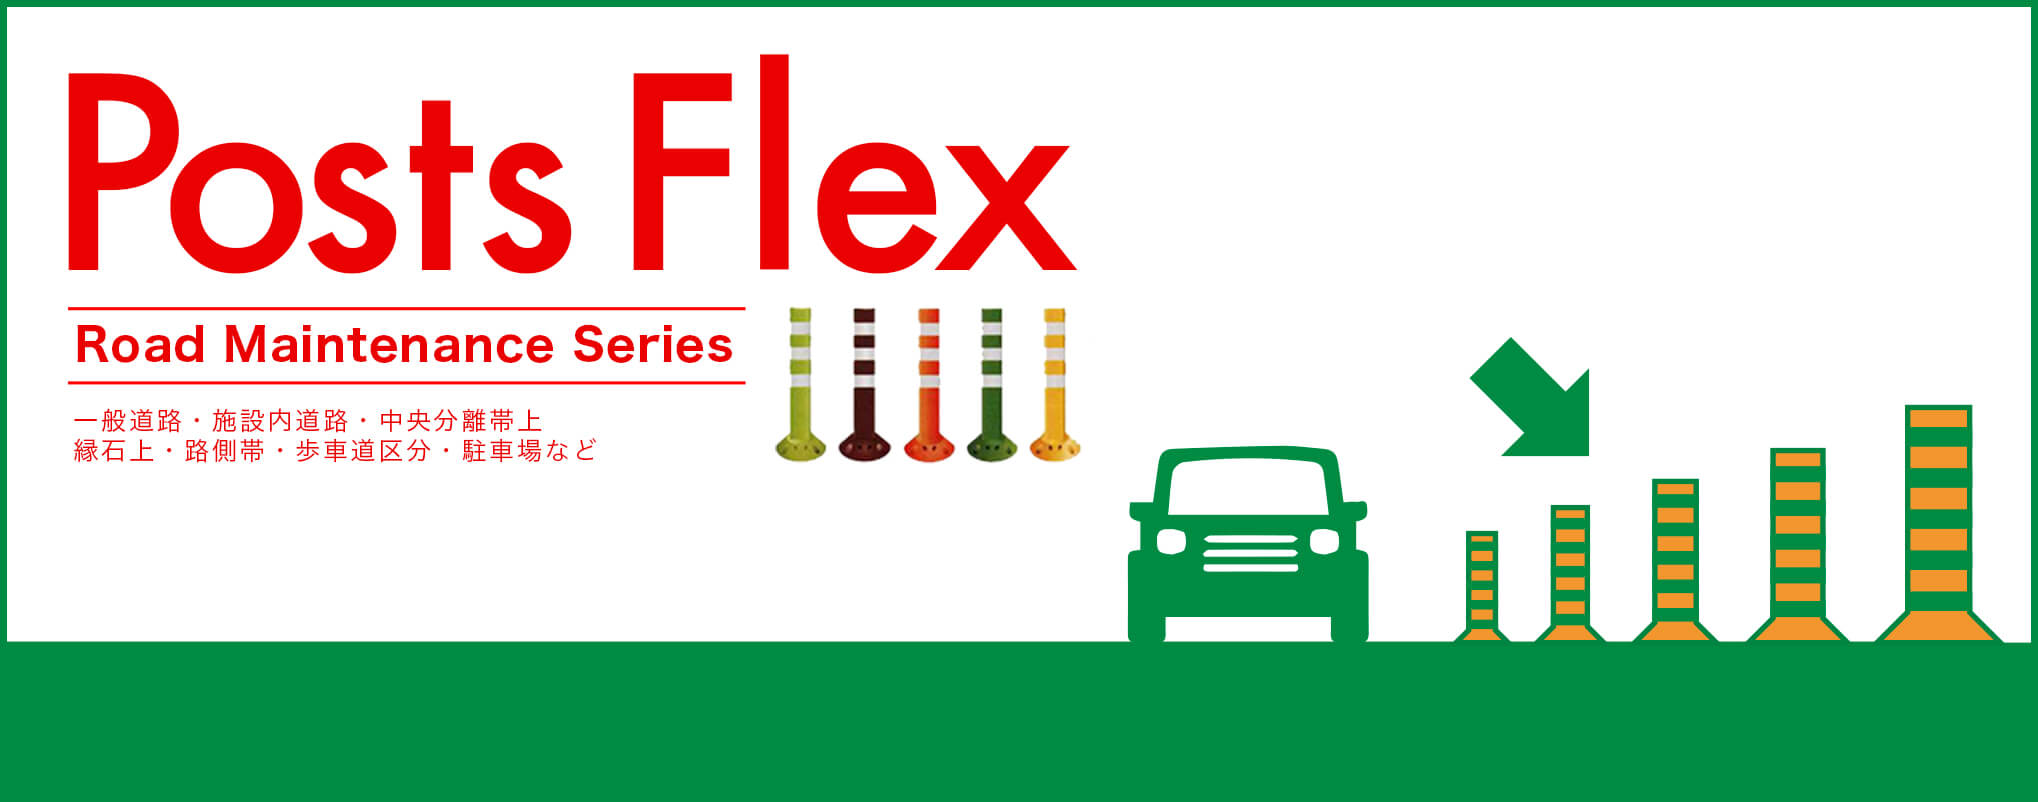 Posts Flex